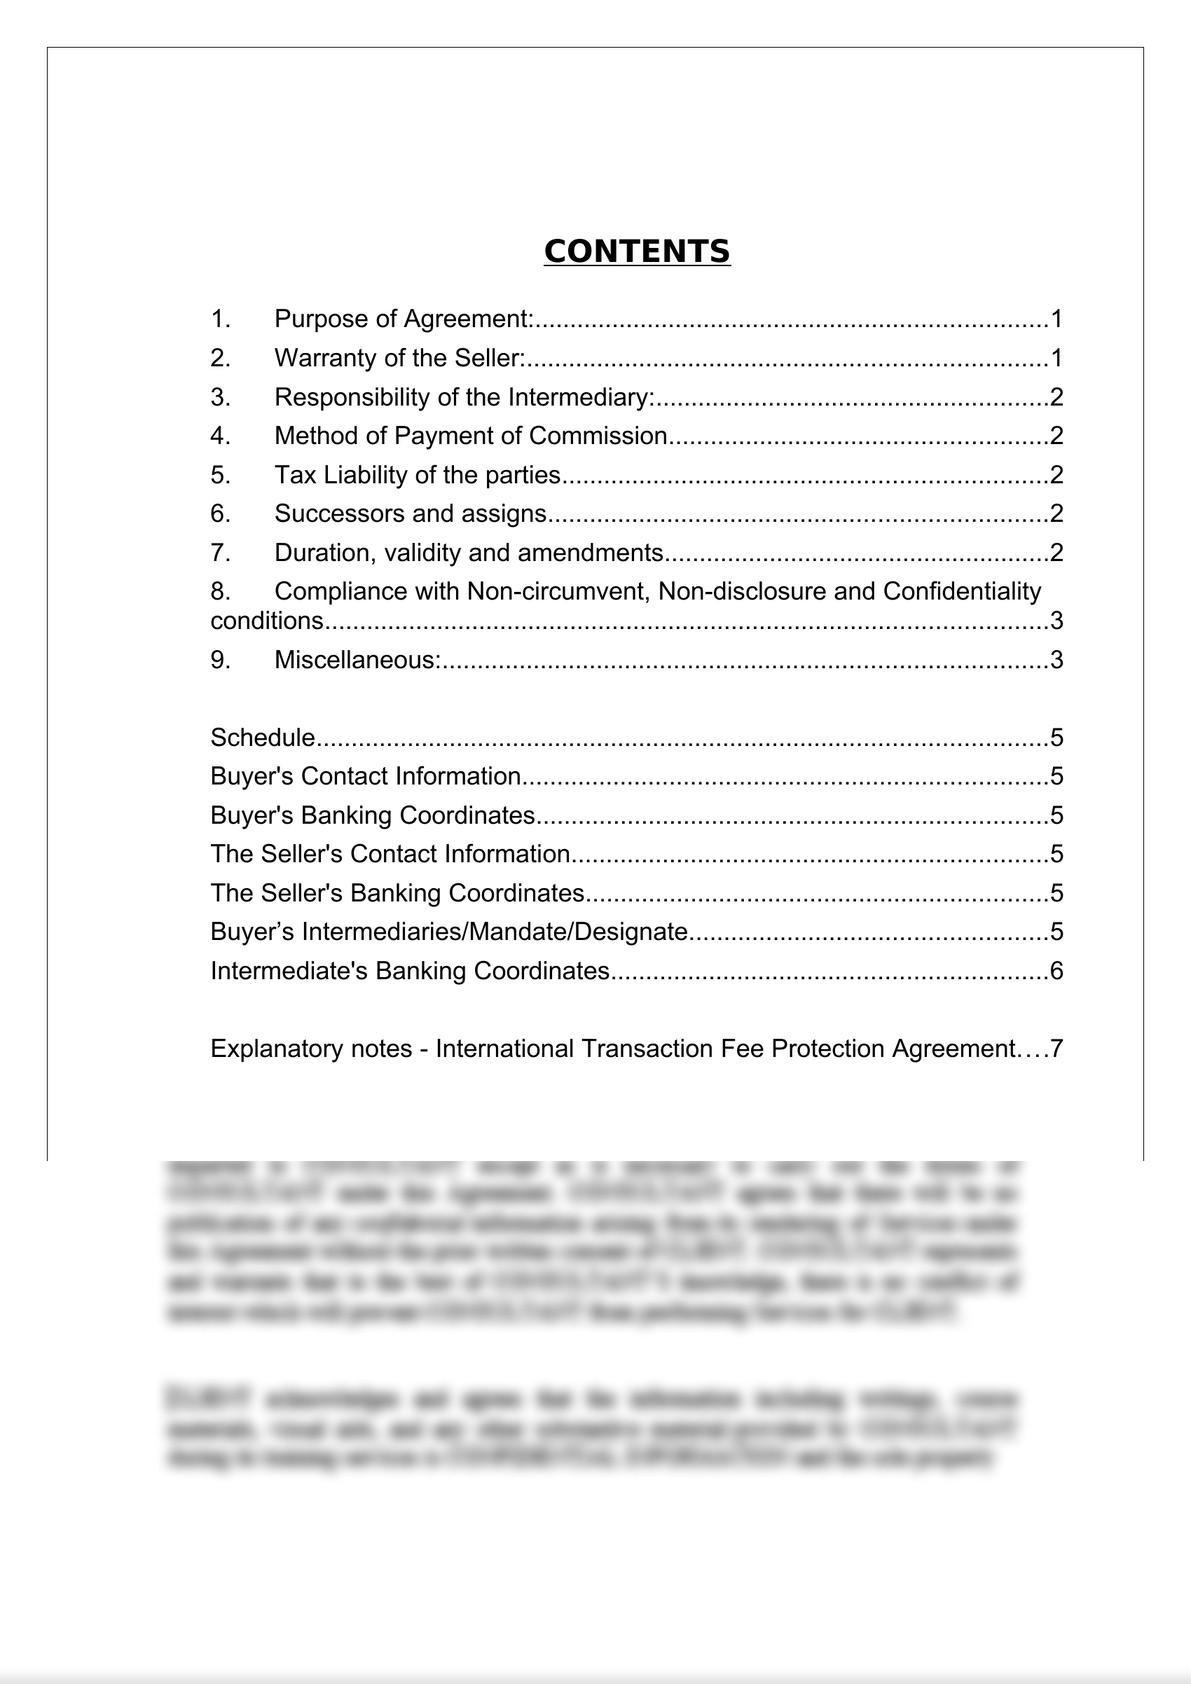 International Transaction Fee Protection Agreement-1